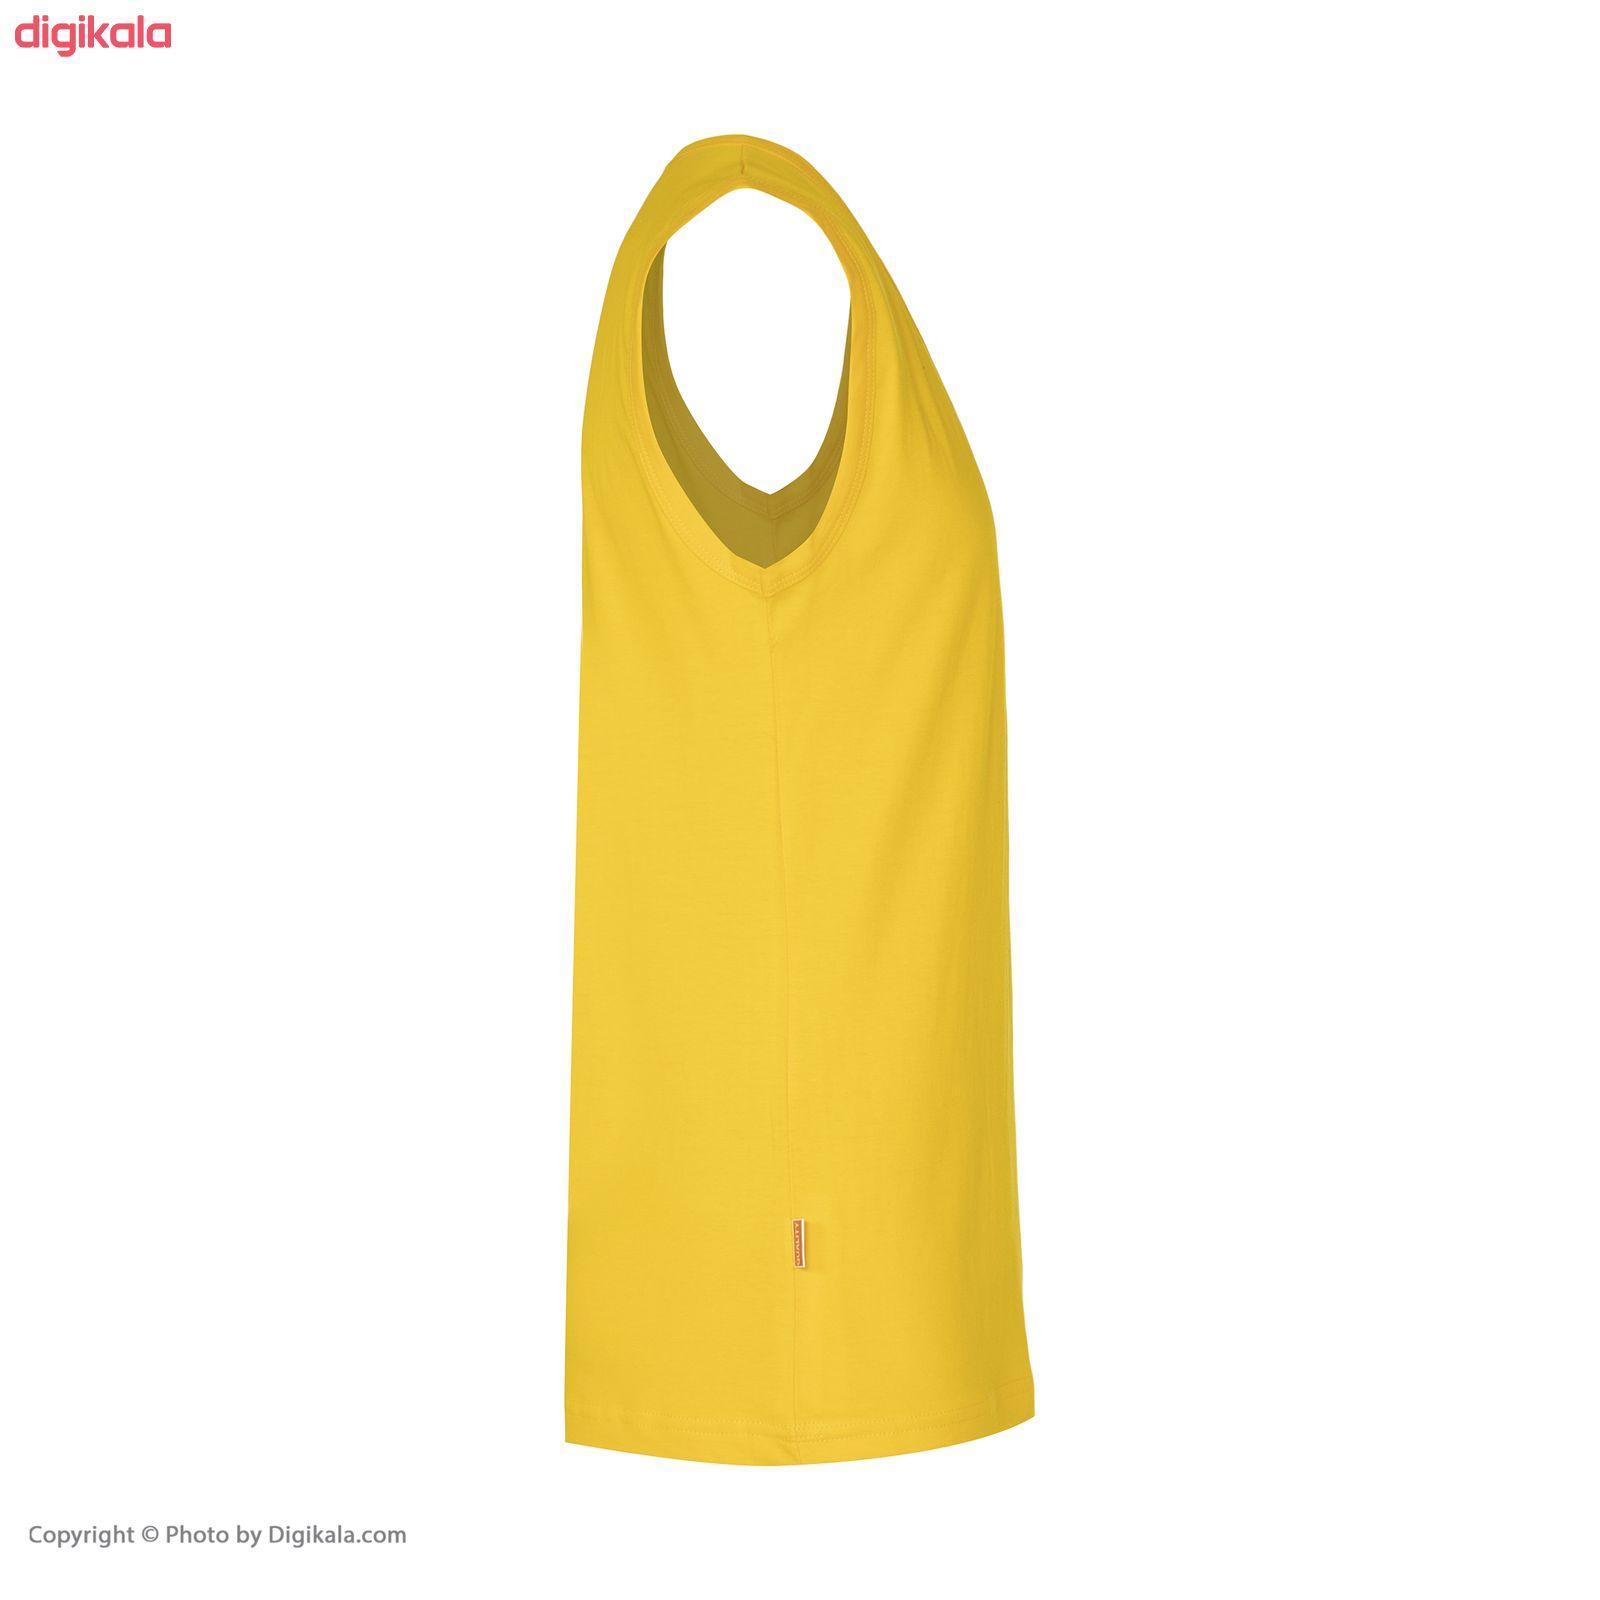 زیرپوش بدون آستین مردانه کوالیتی مدل QR 86 main 1 3